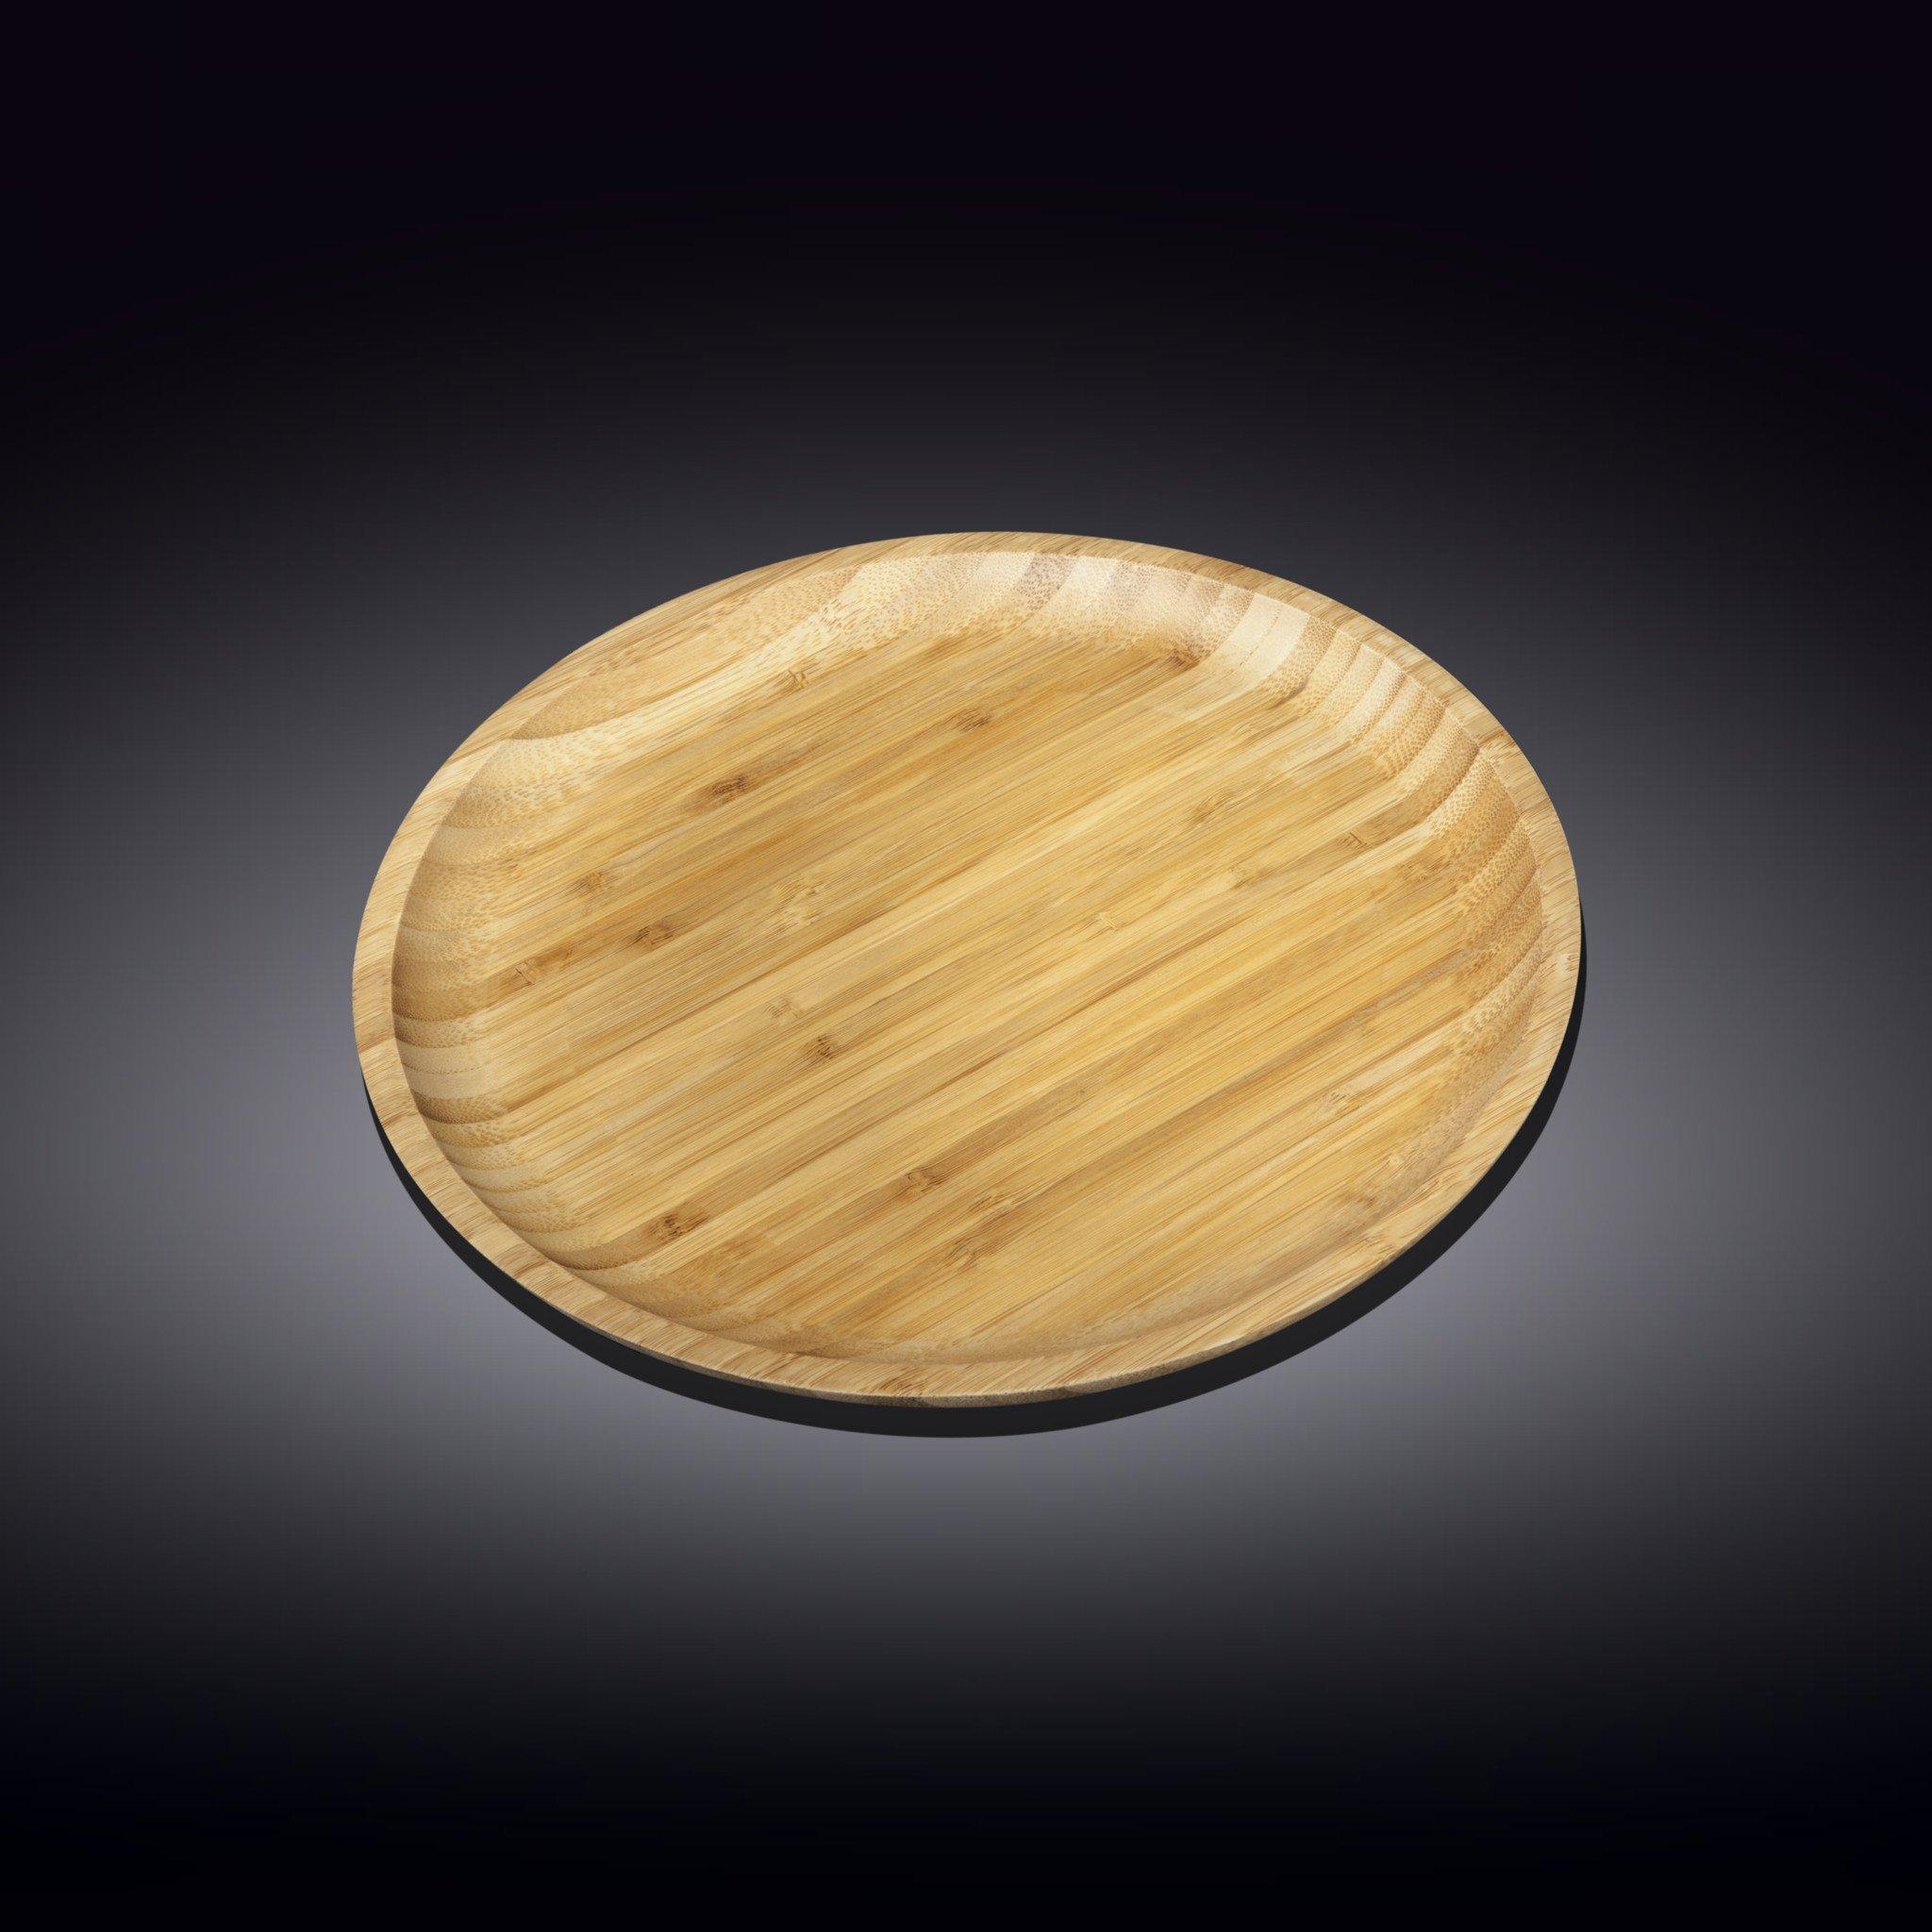 Тарелка бамбуковая Wilmax сервировочная круглая 23 см